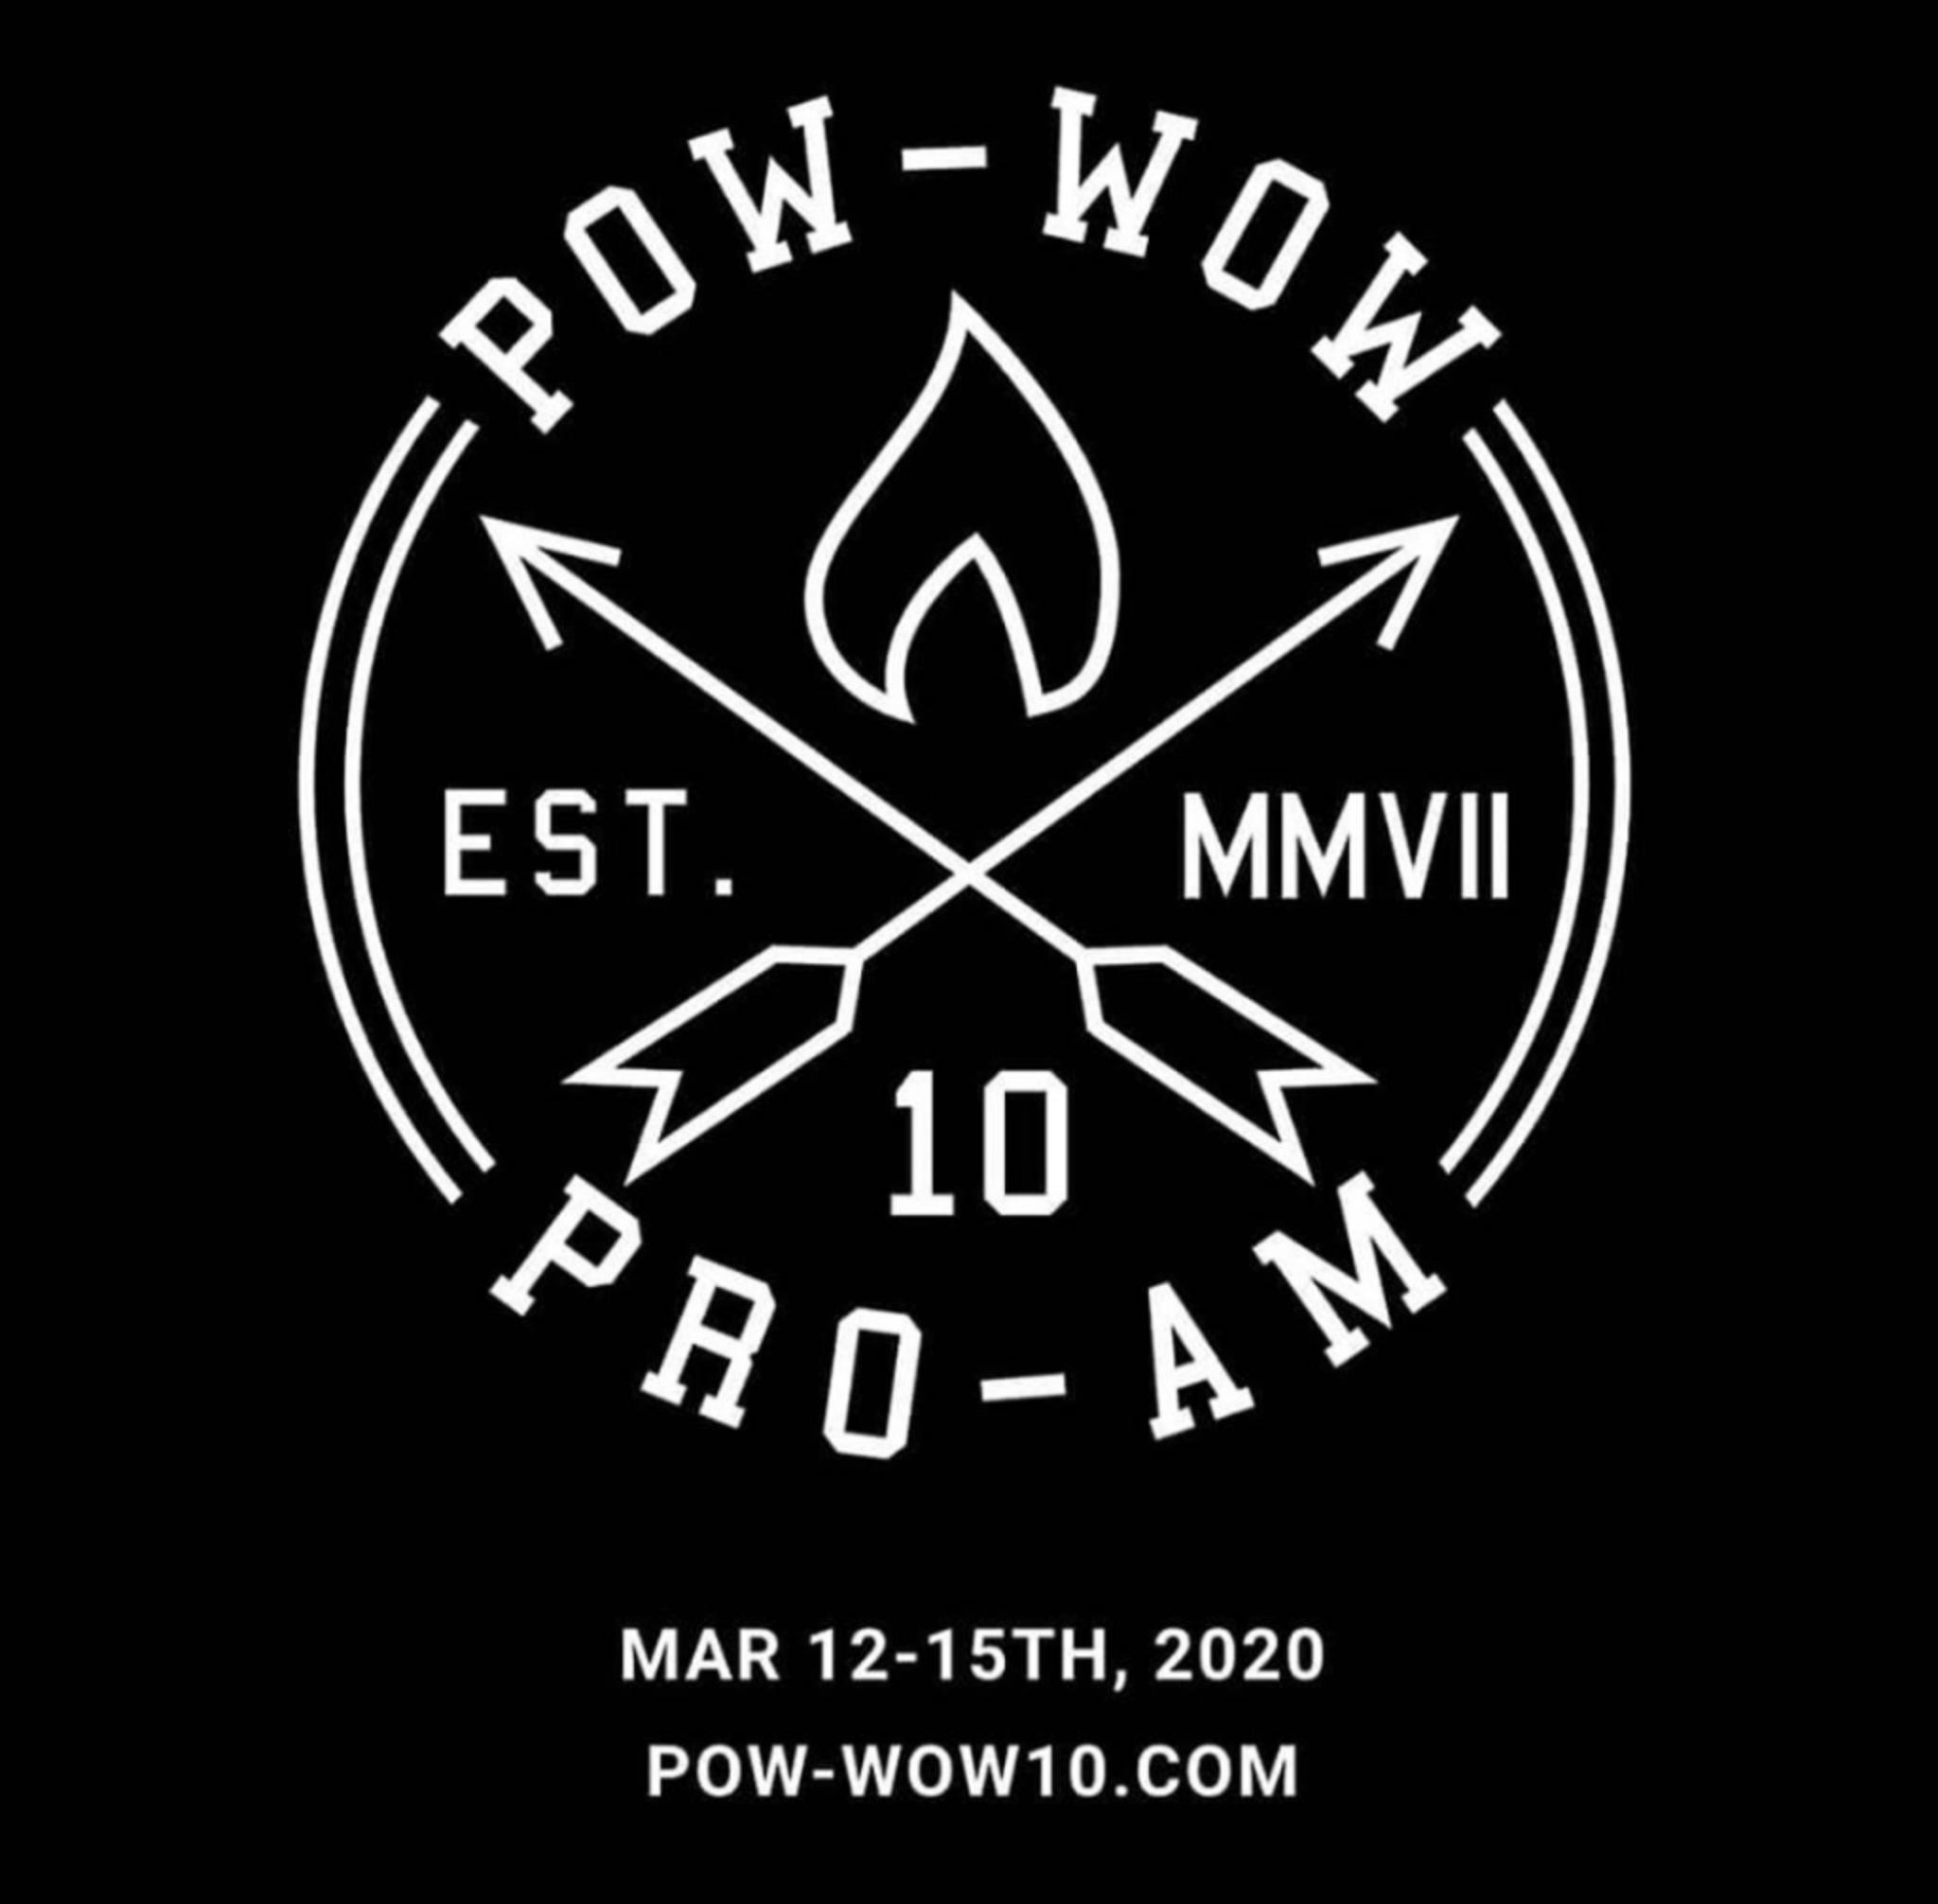 POWWOW2020.png